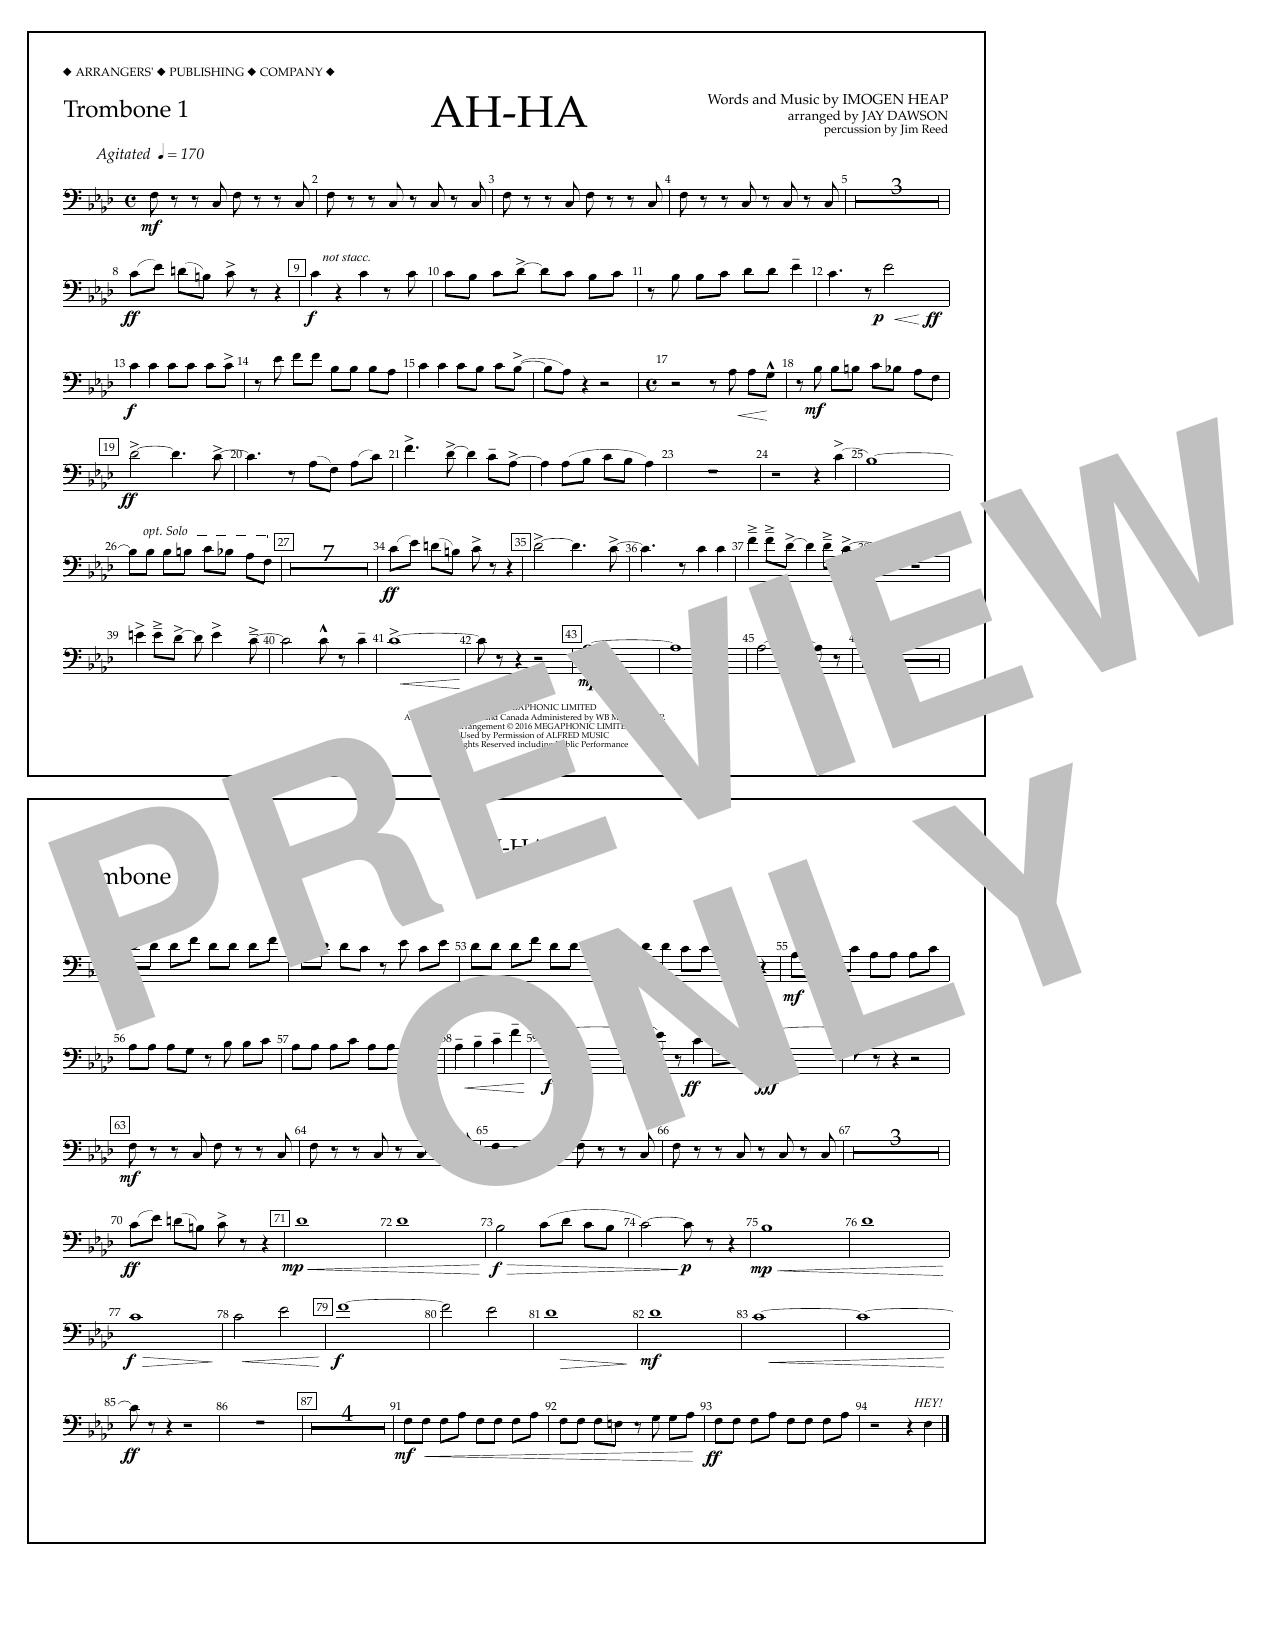 Jay Dawson Ah-ha - Trombone 1 sheet music notes and chords. Download Printable PDF.